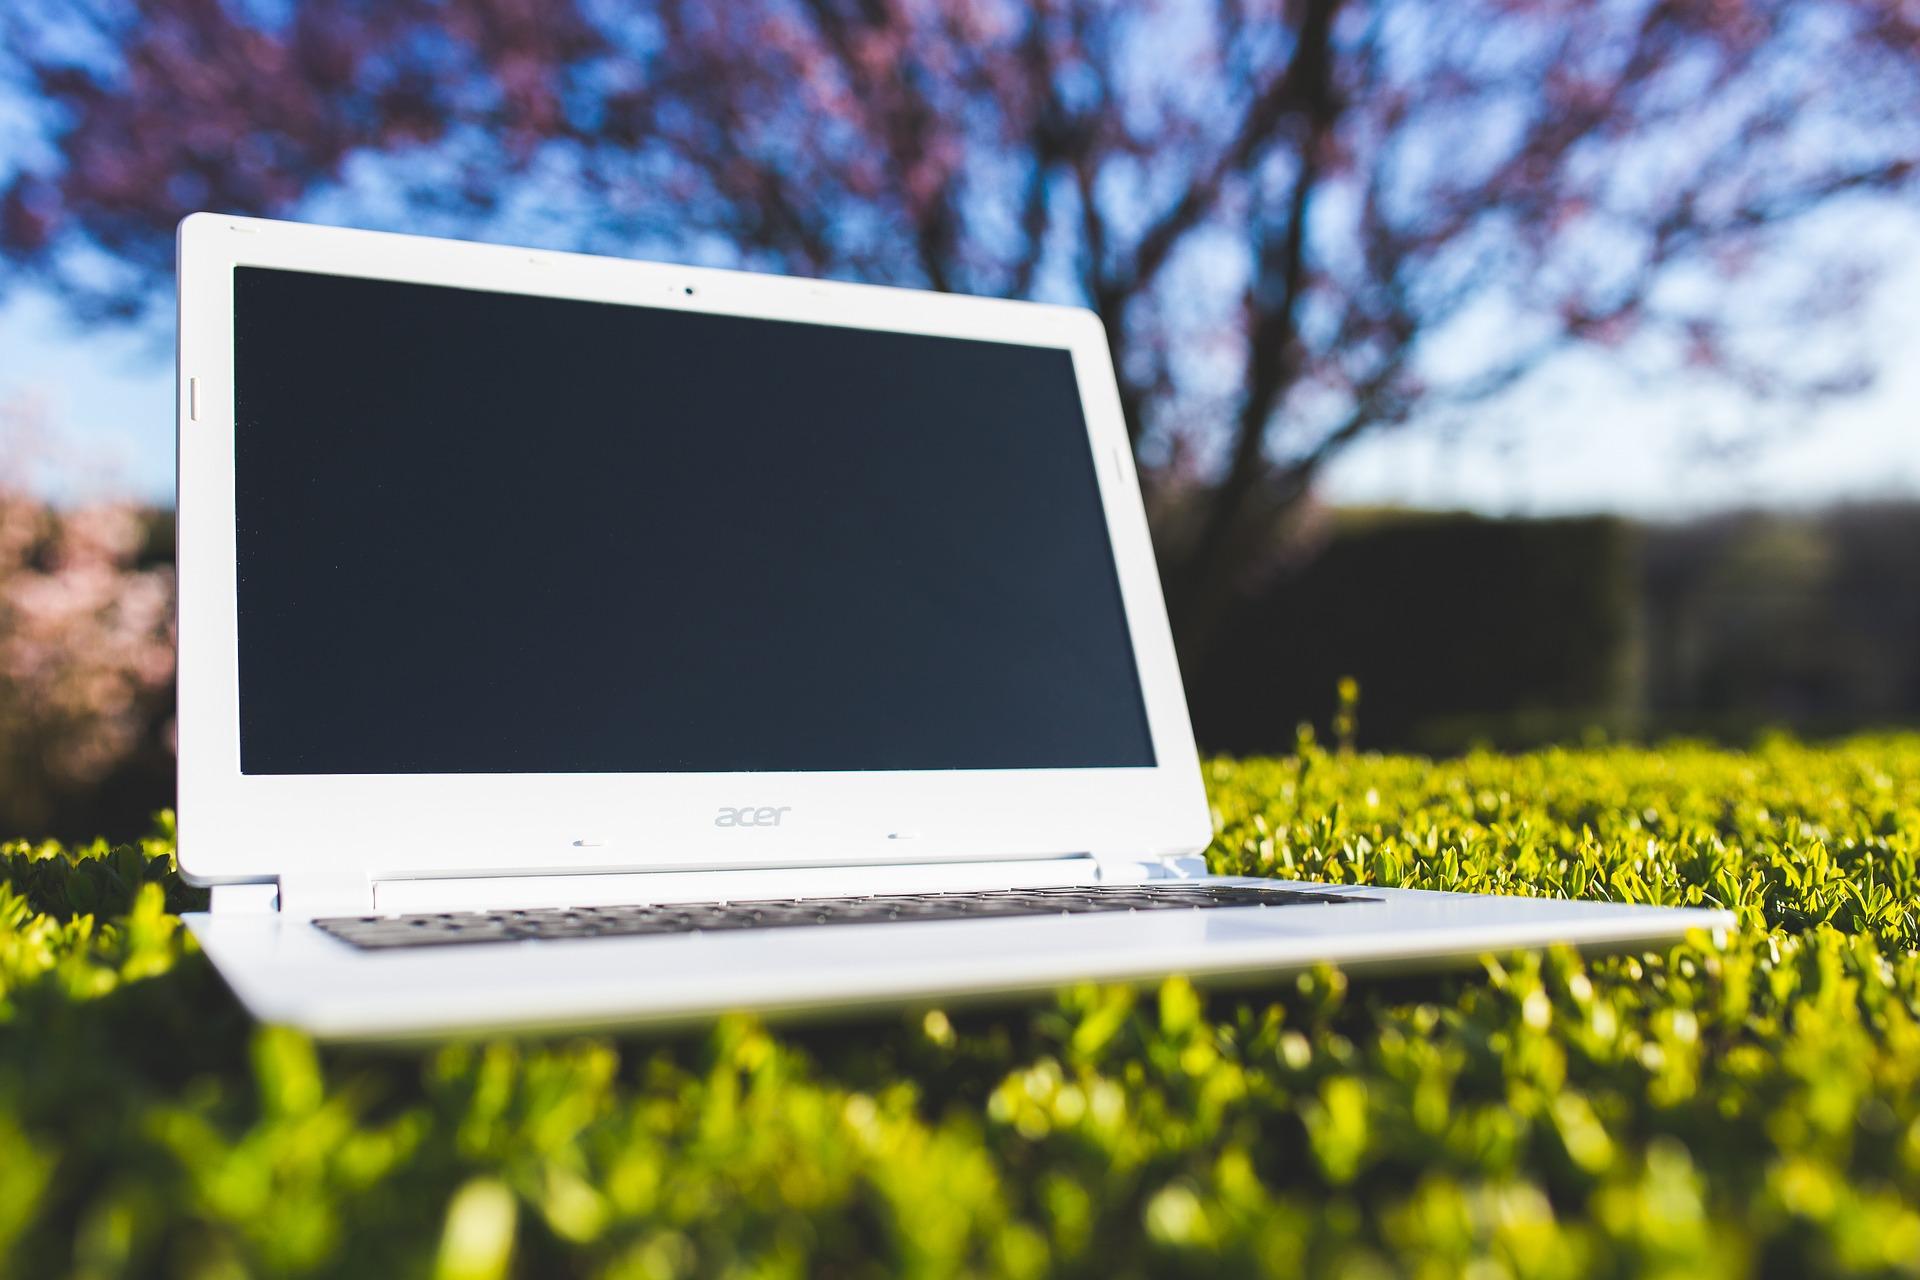 Laptop sitting on grass